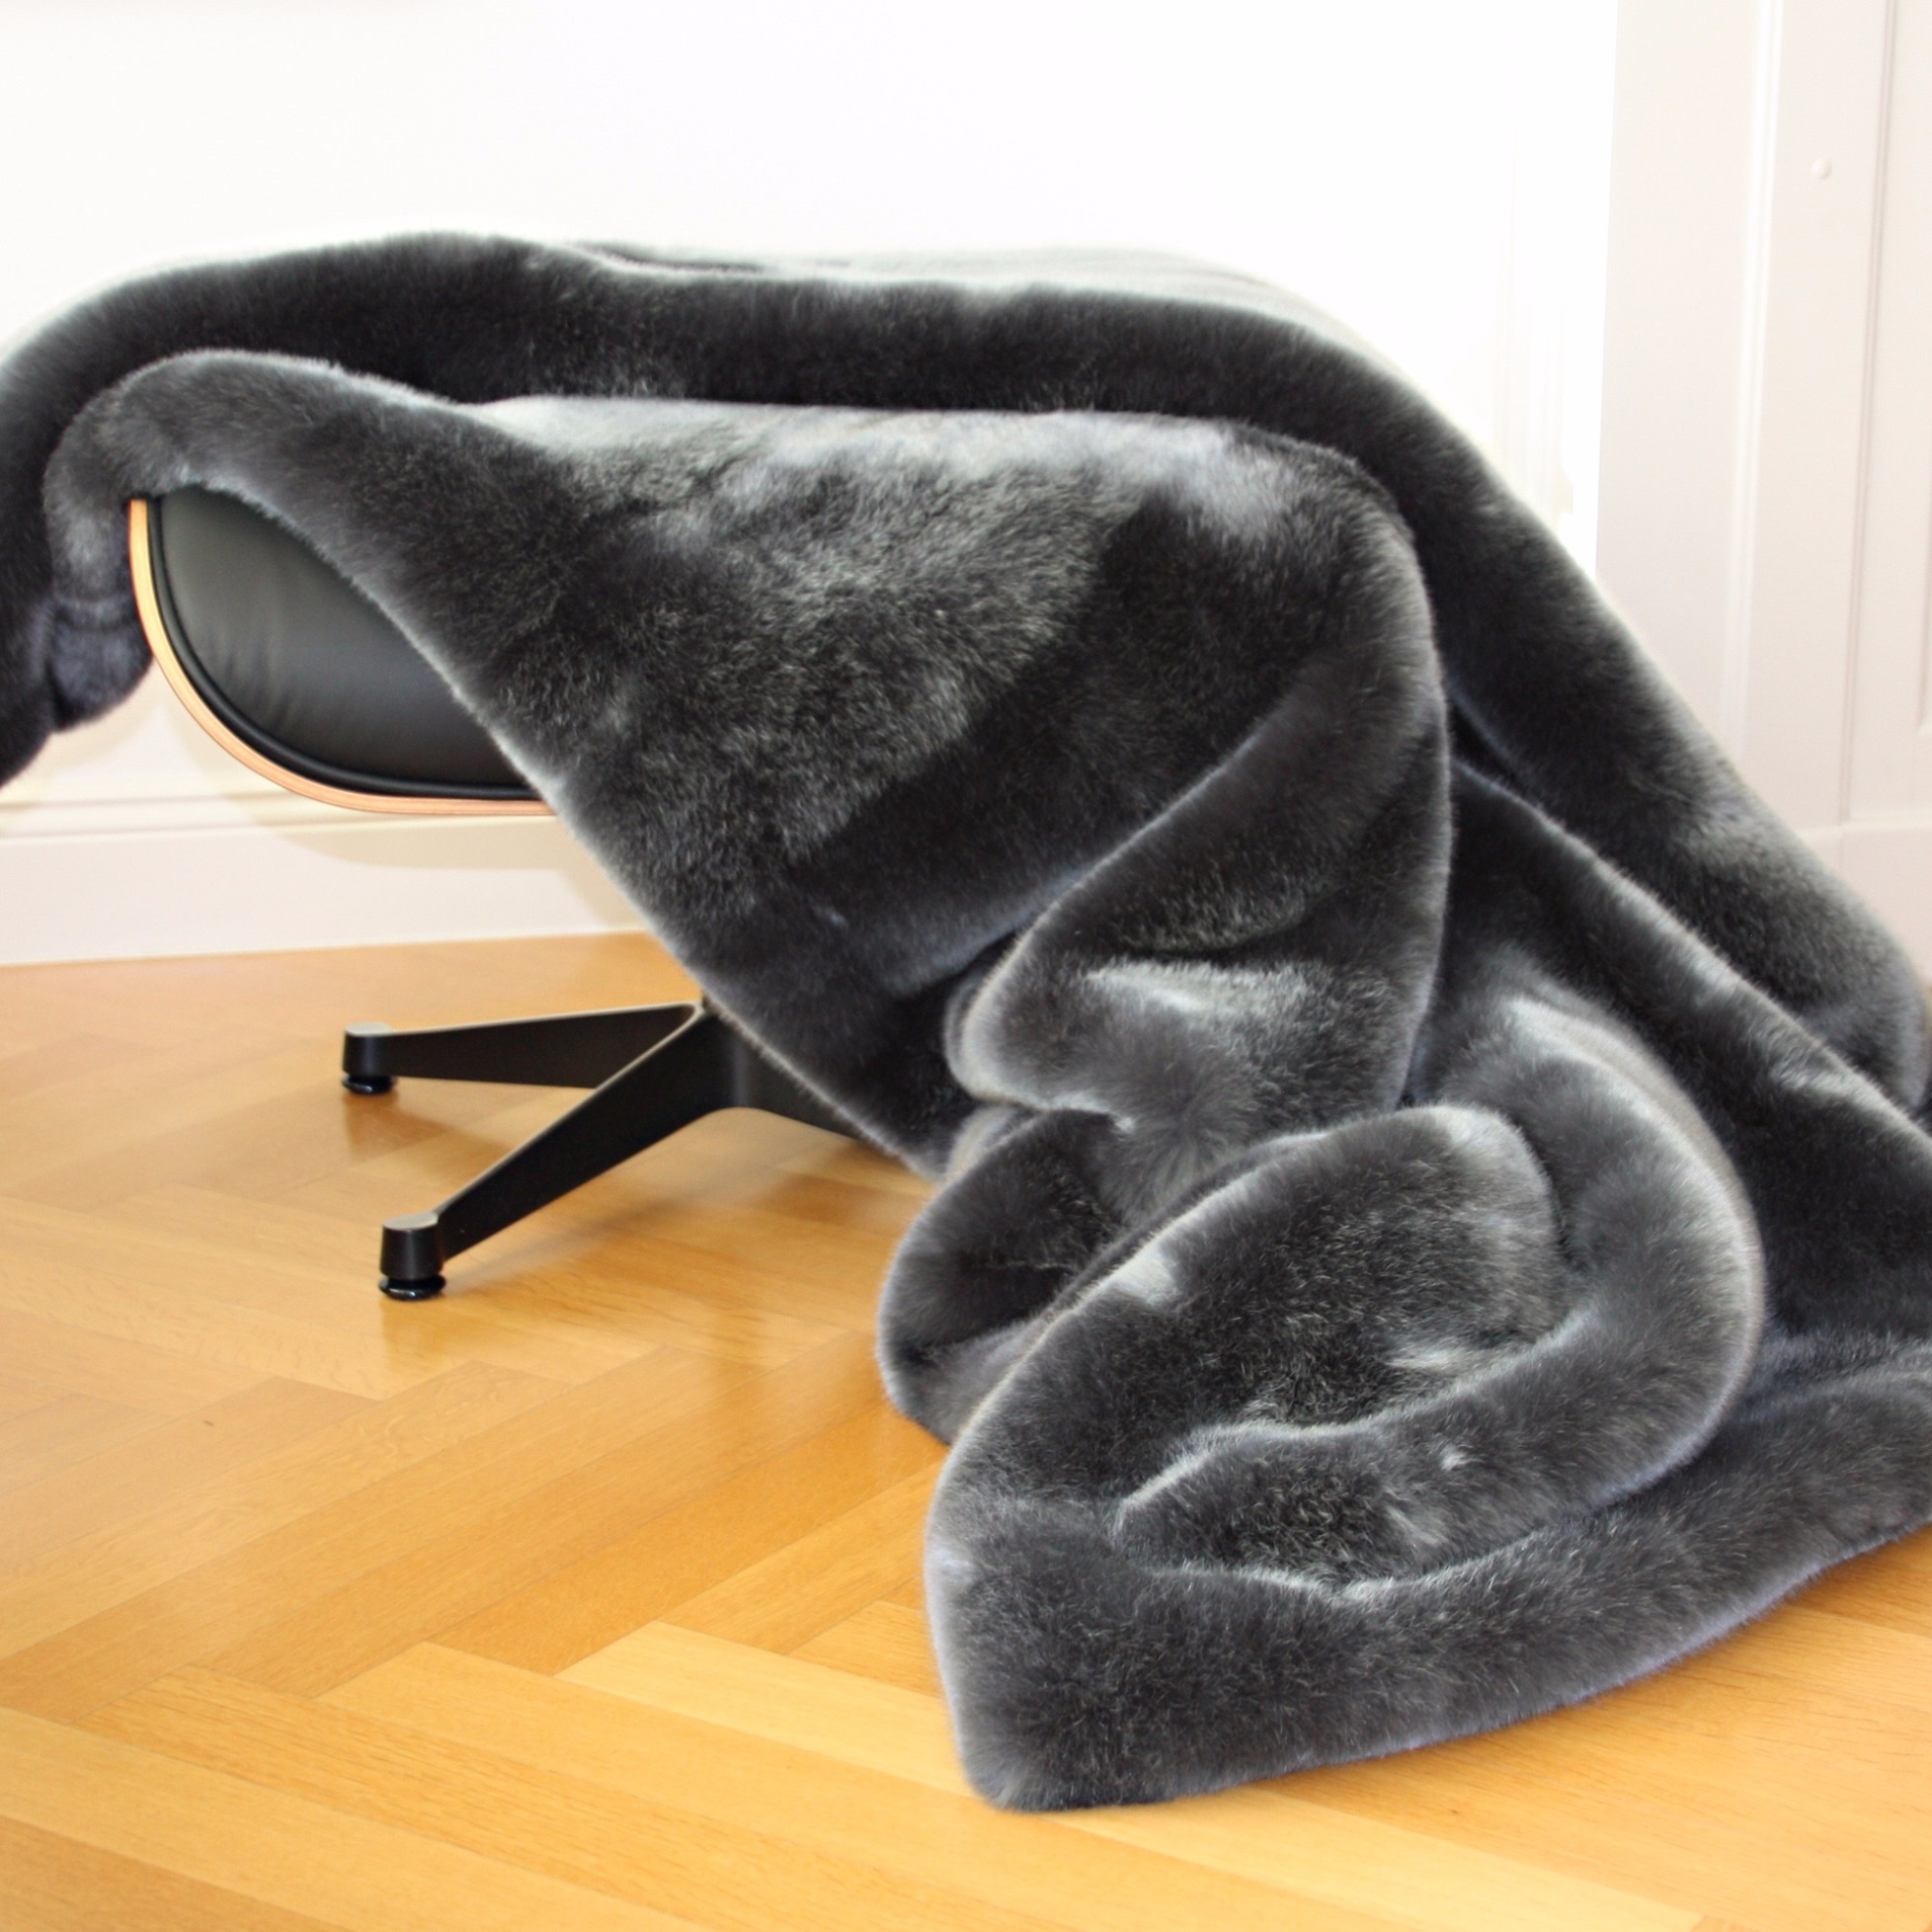 webpelz plaid kissen sehhund grau von carma. Black Bedroom Furniture Sets. Home Design Ideas